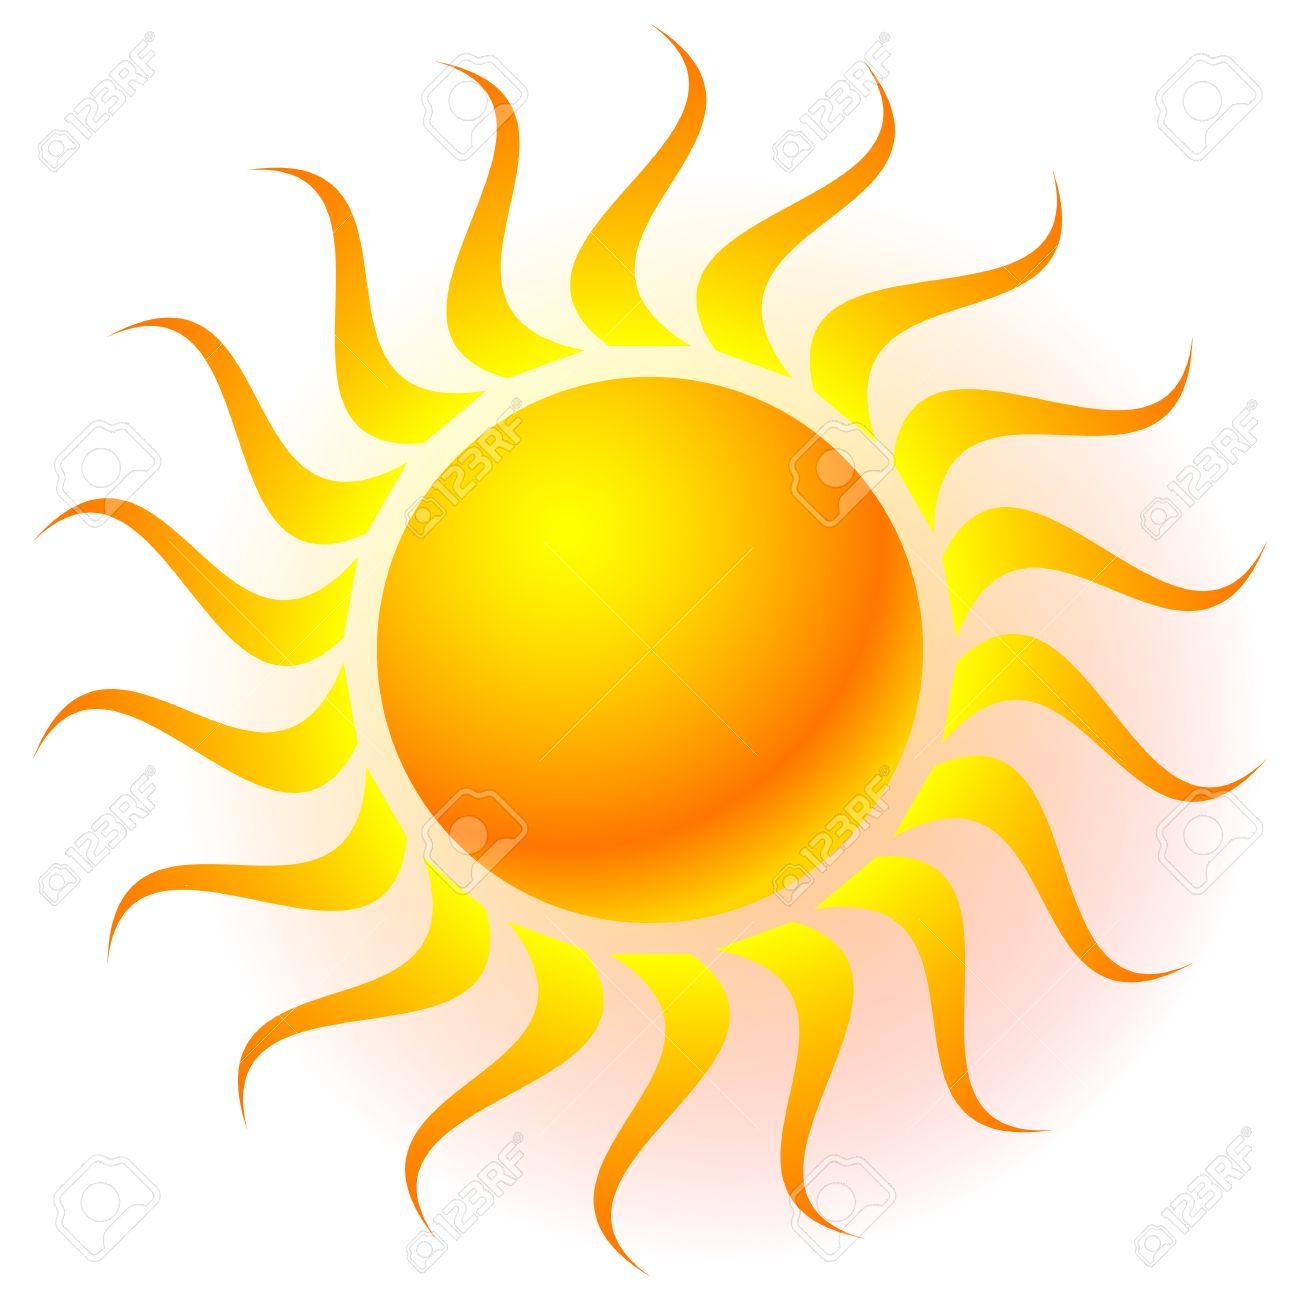 1300x1300 Sun Clip Art With Transparent Glow Effect. Sun Shine, Weather